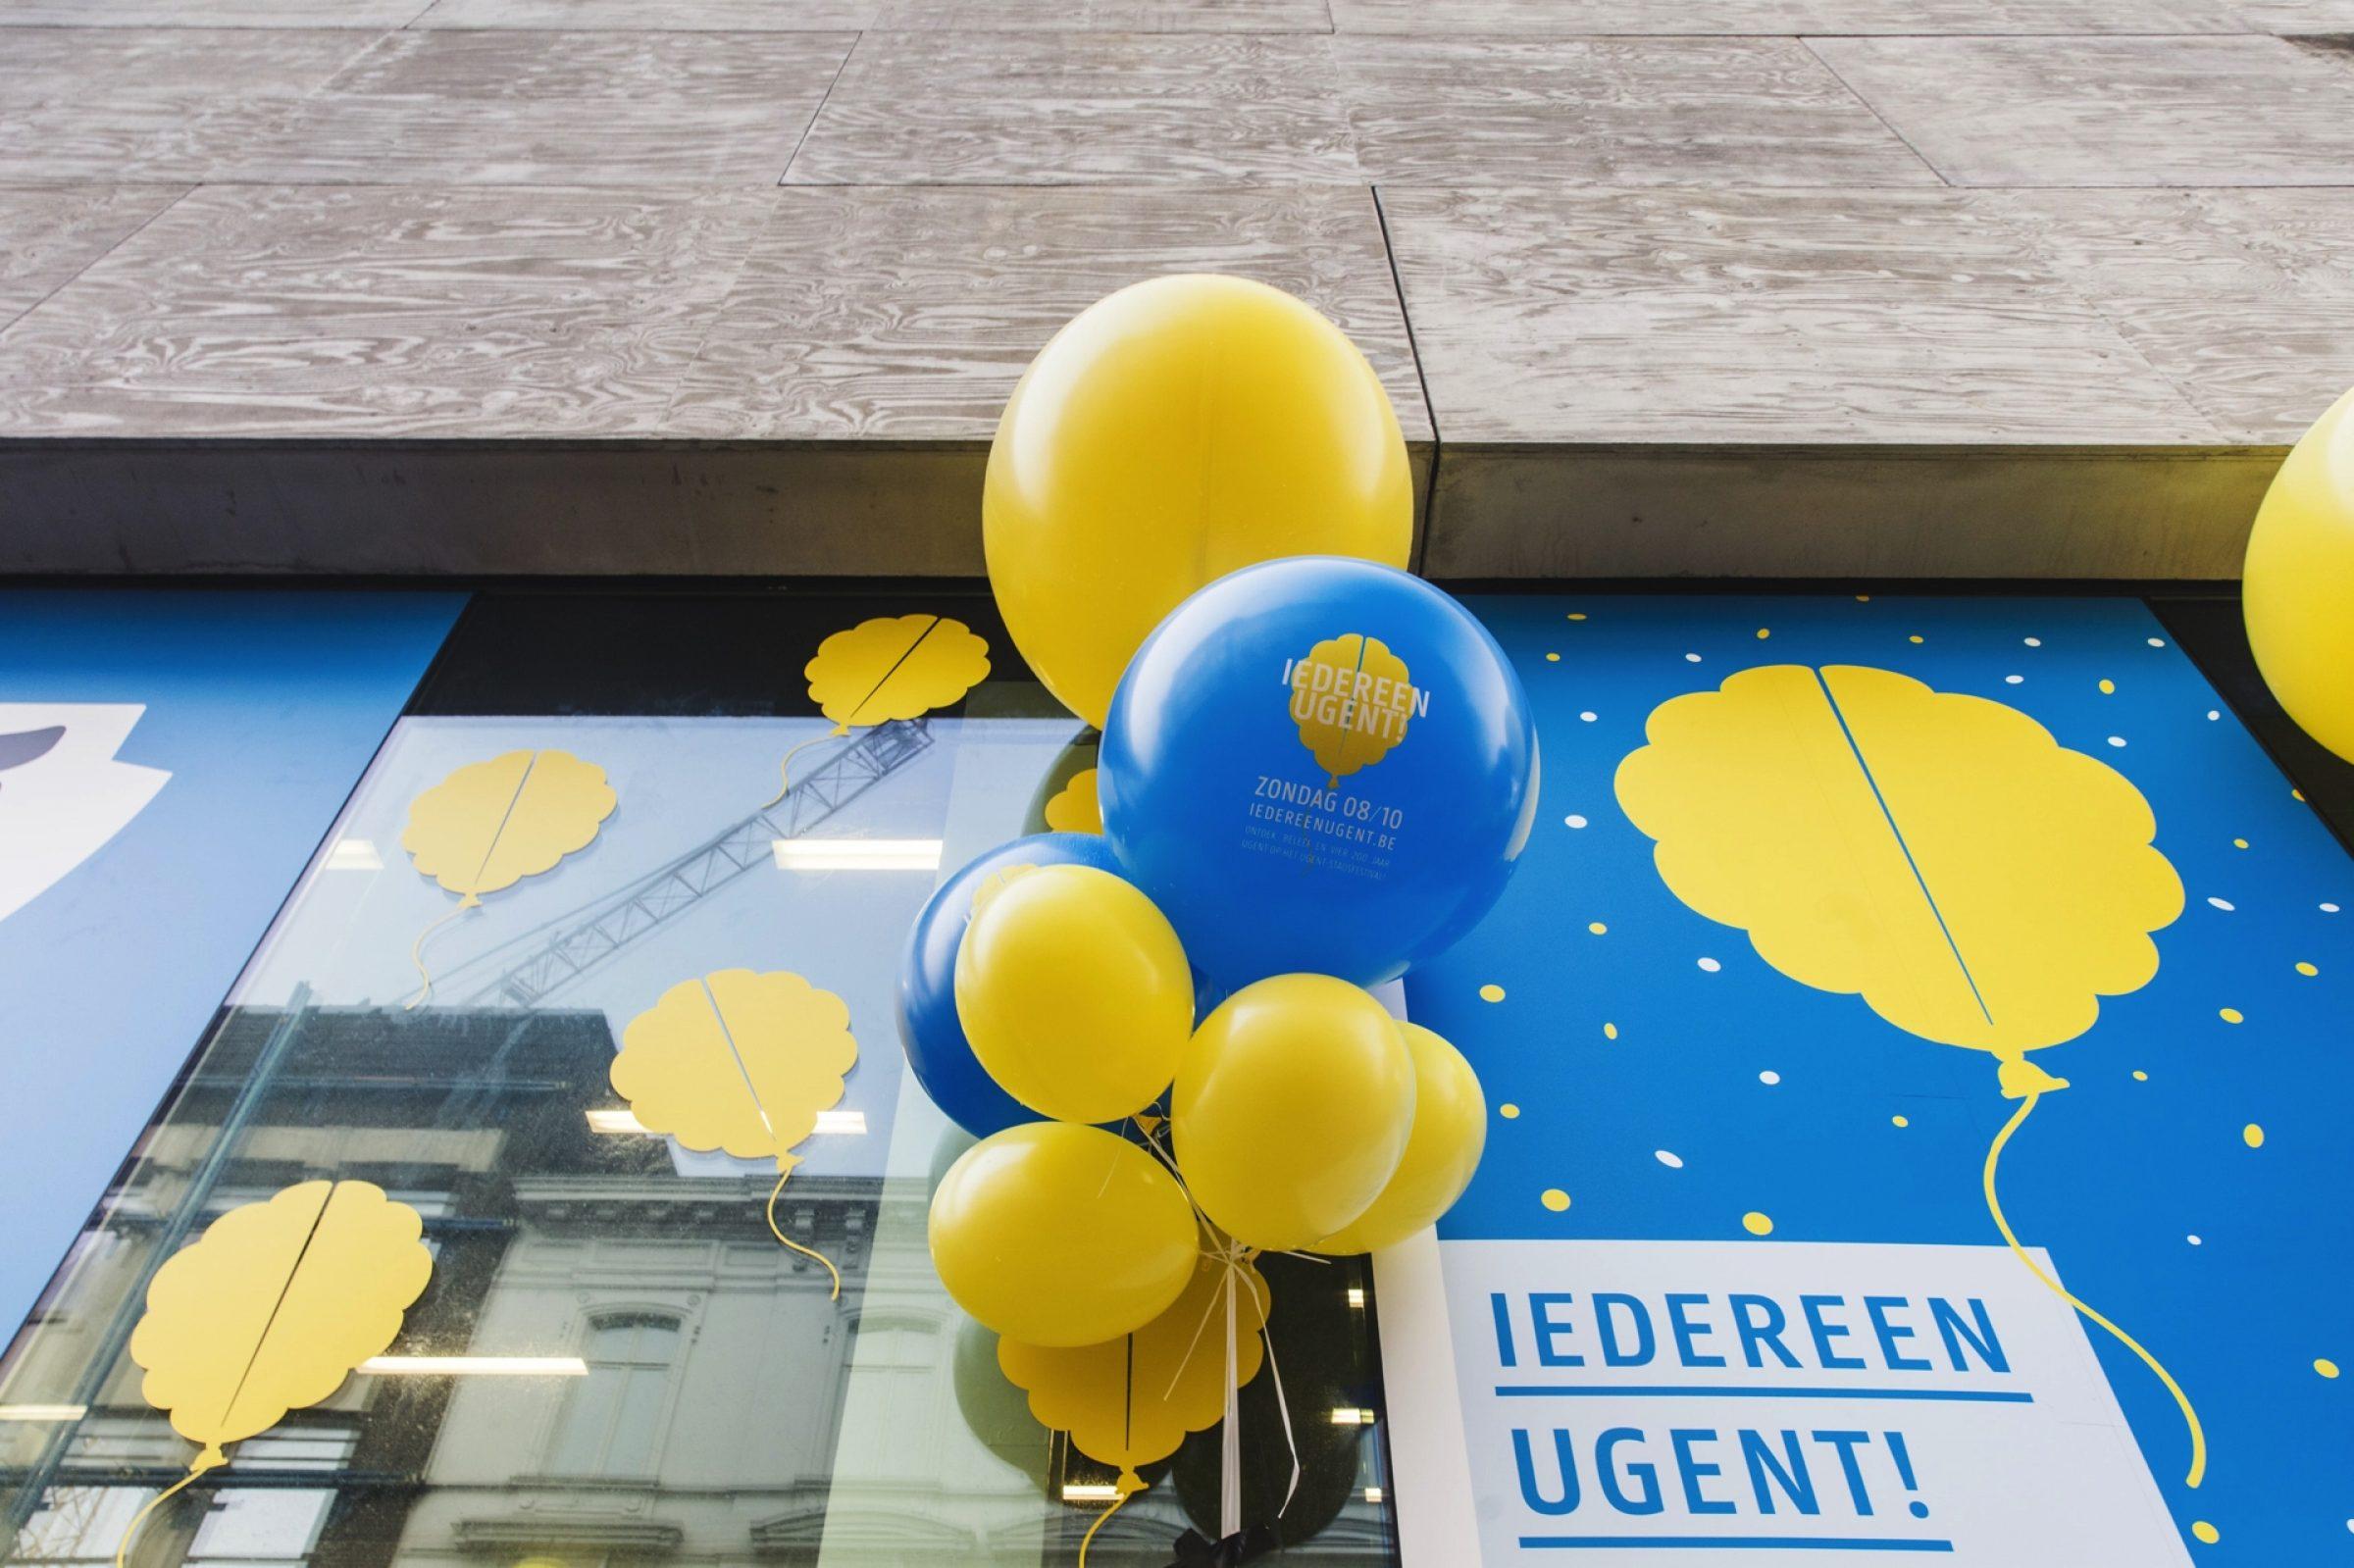 Fast Forward Eventbureau Gent Ugent Creative Event200J Ugent 4